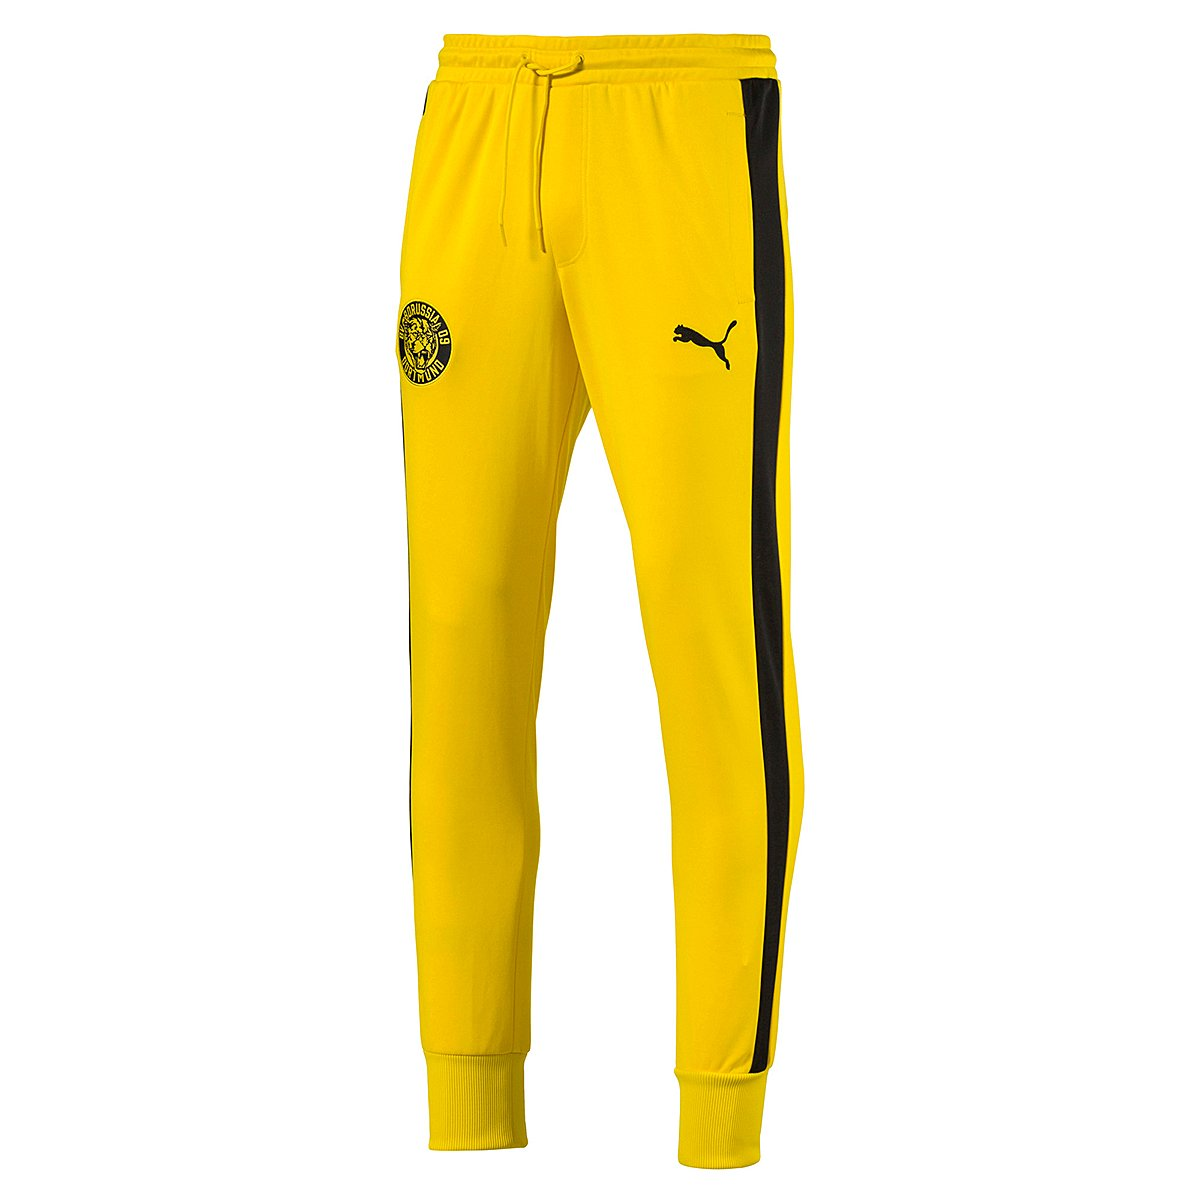 Puma Borussia Dortmund BVB T7 Pants Herren Hose Trainingshose 754098 01 Gelb